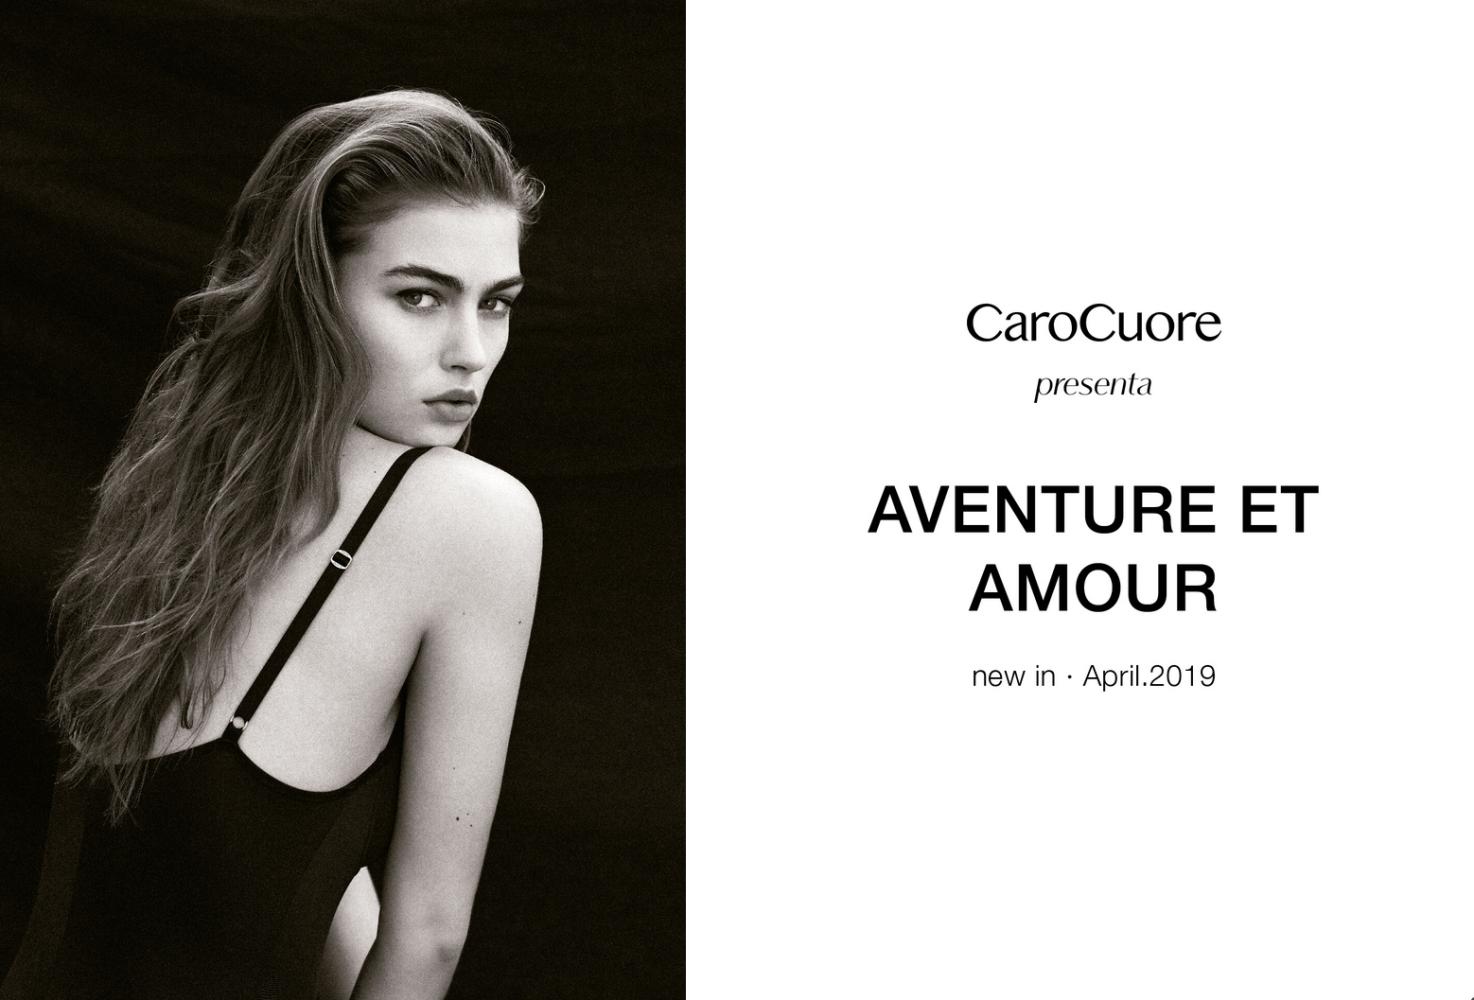 CaroCuore Present Aventure Et Amour Featuring Sophie Evi